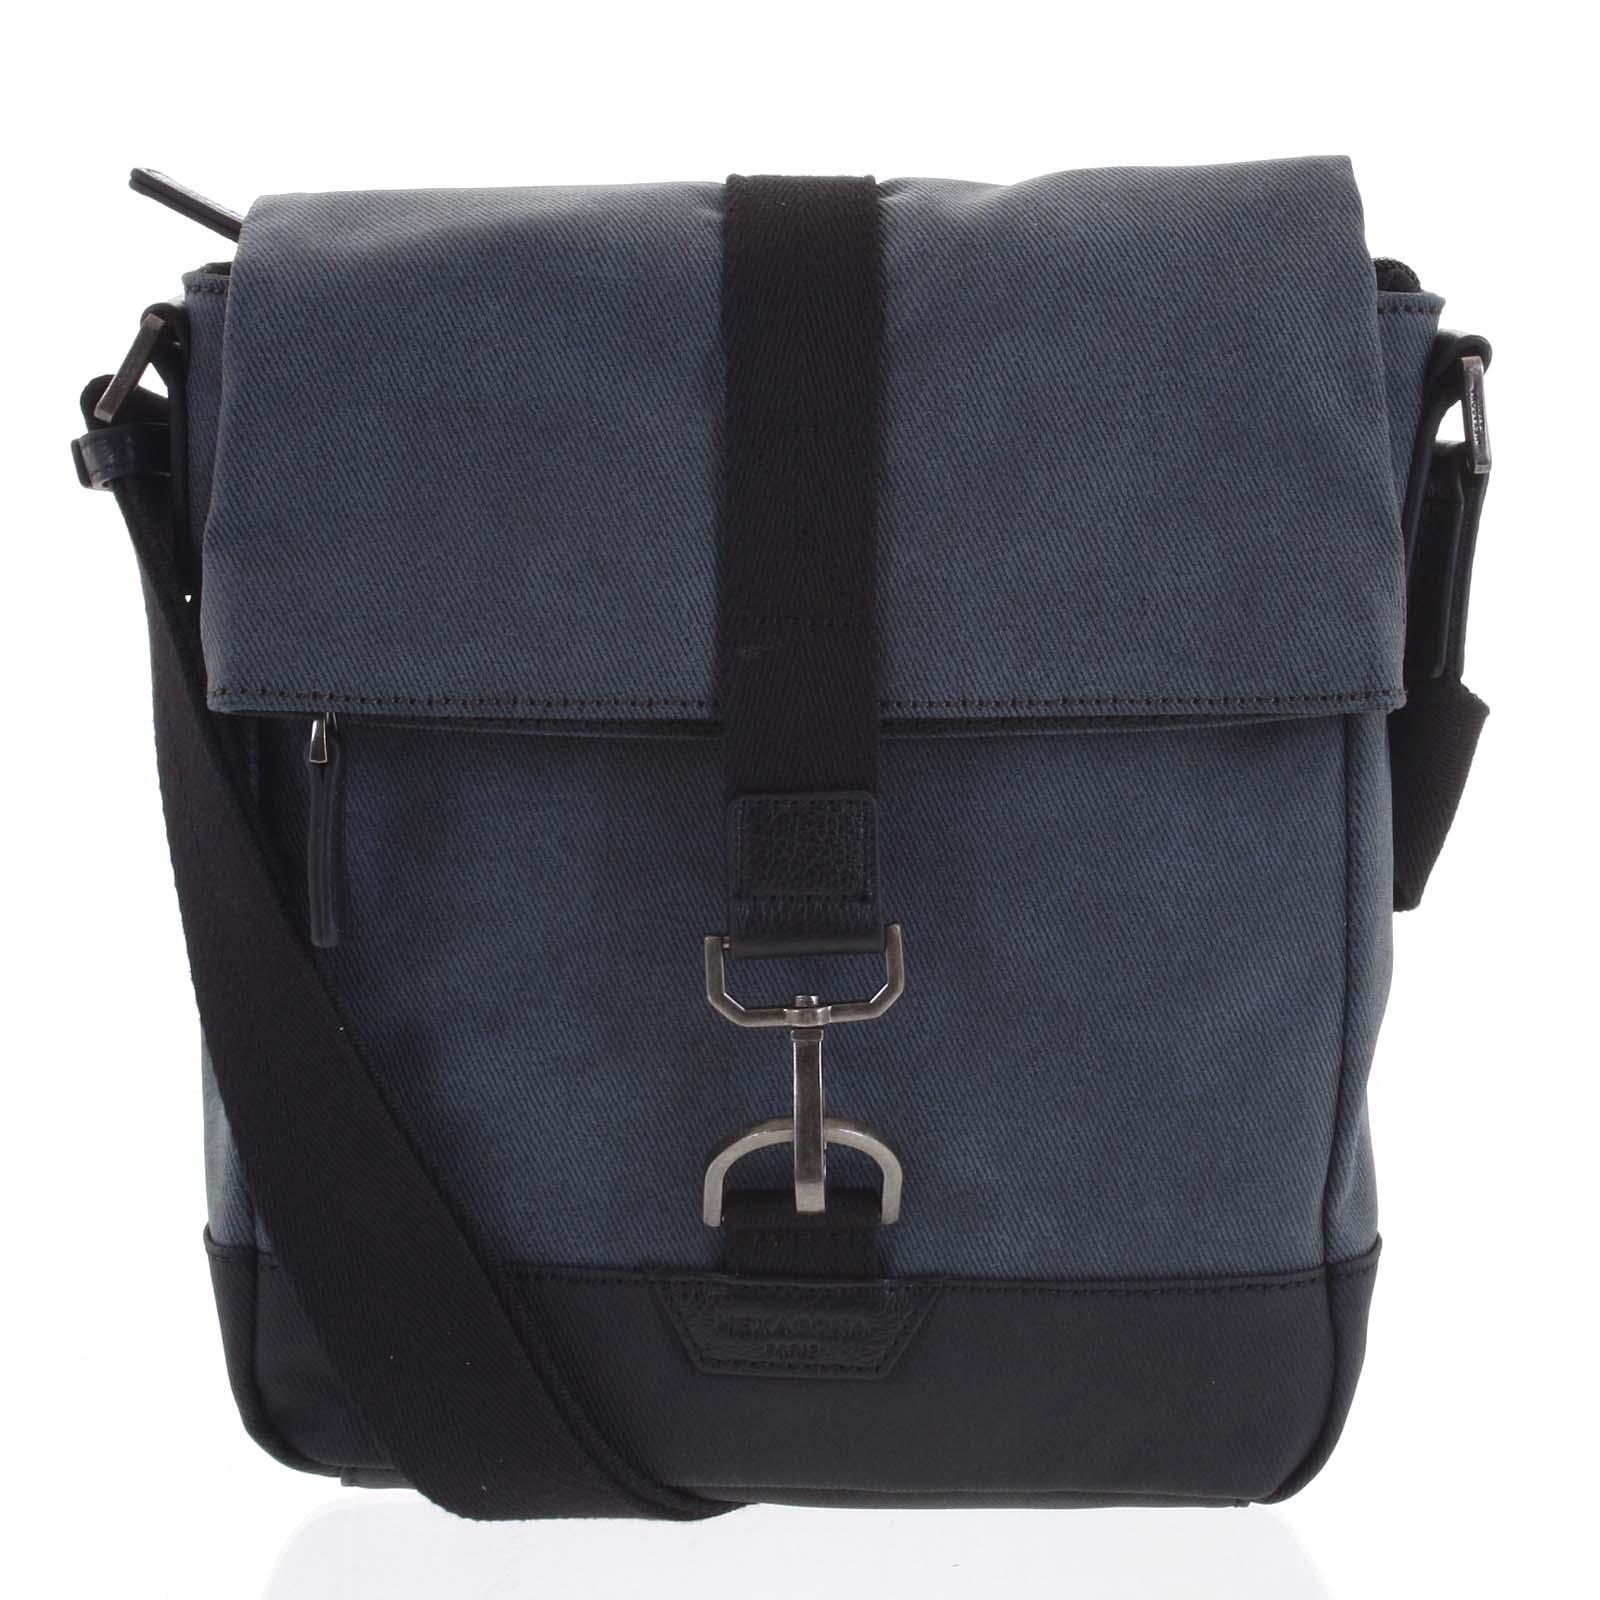 Pánská taška přes rameno modrá - Hexagona Bennio modrá